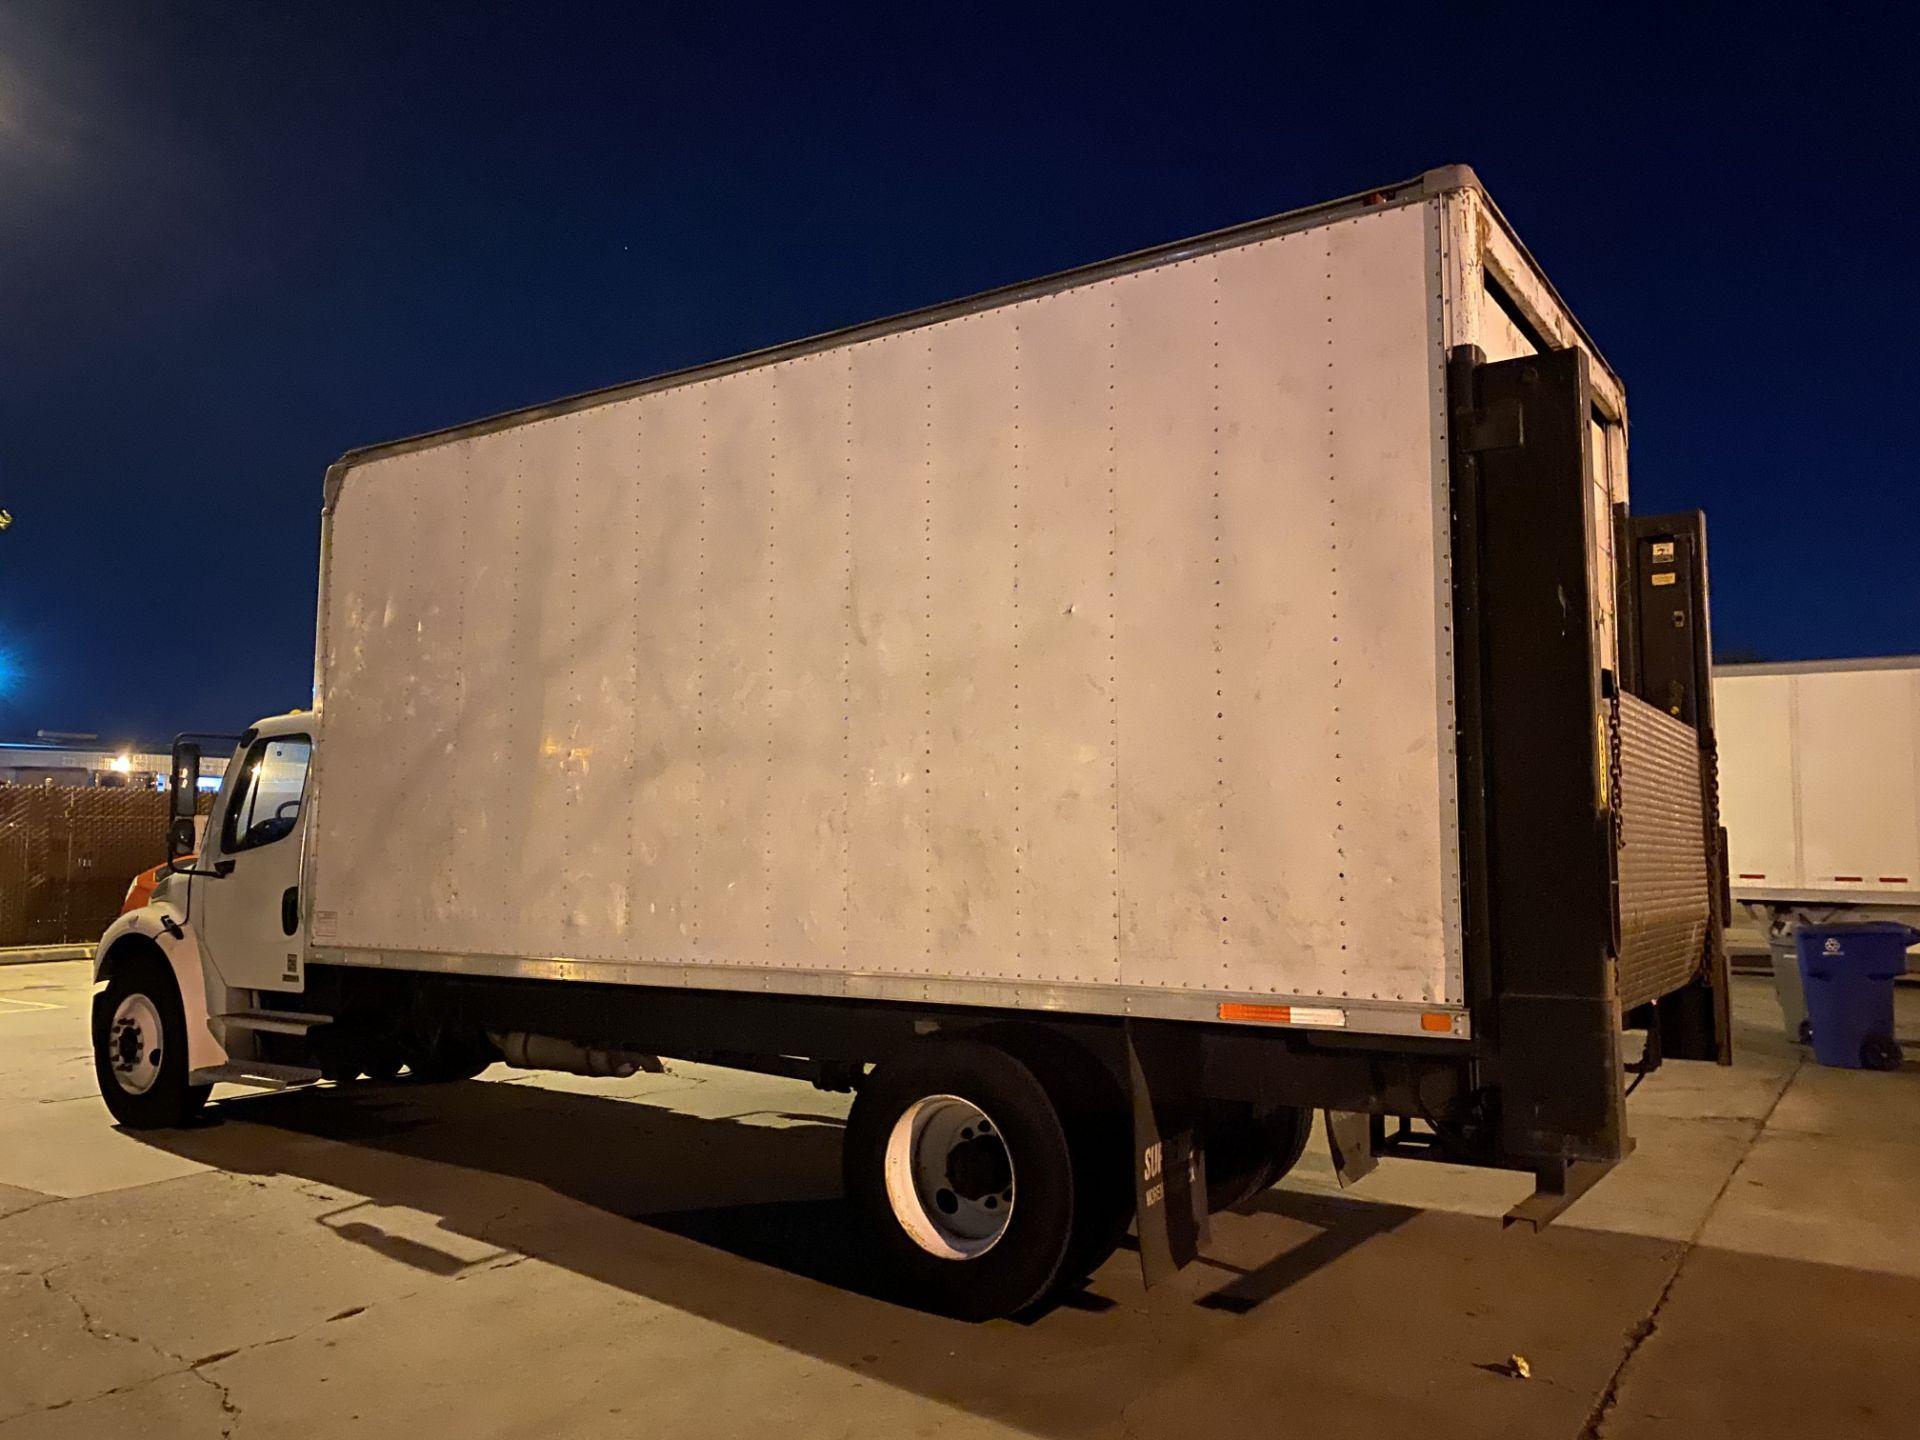 2005 Freightliner dry van truck - Image 2 of 5